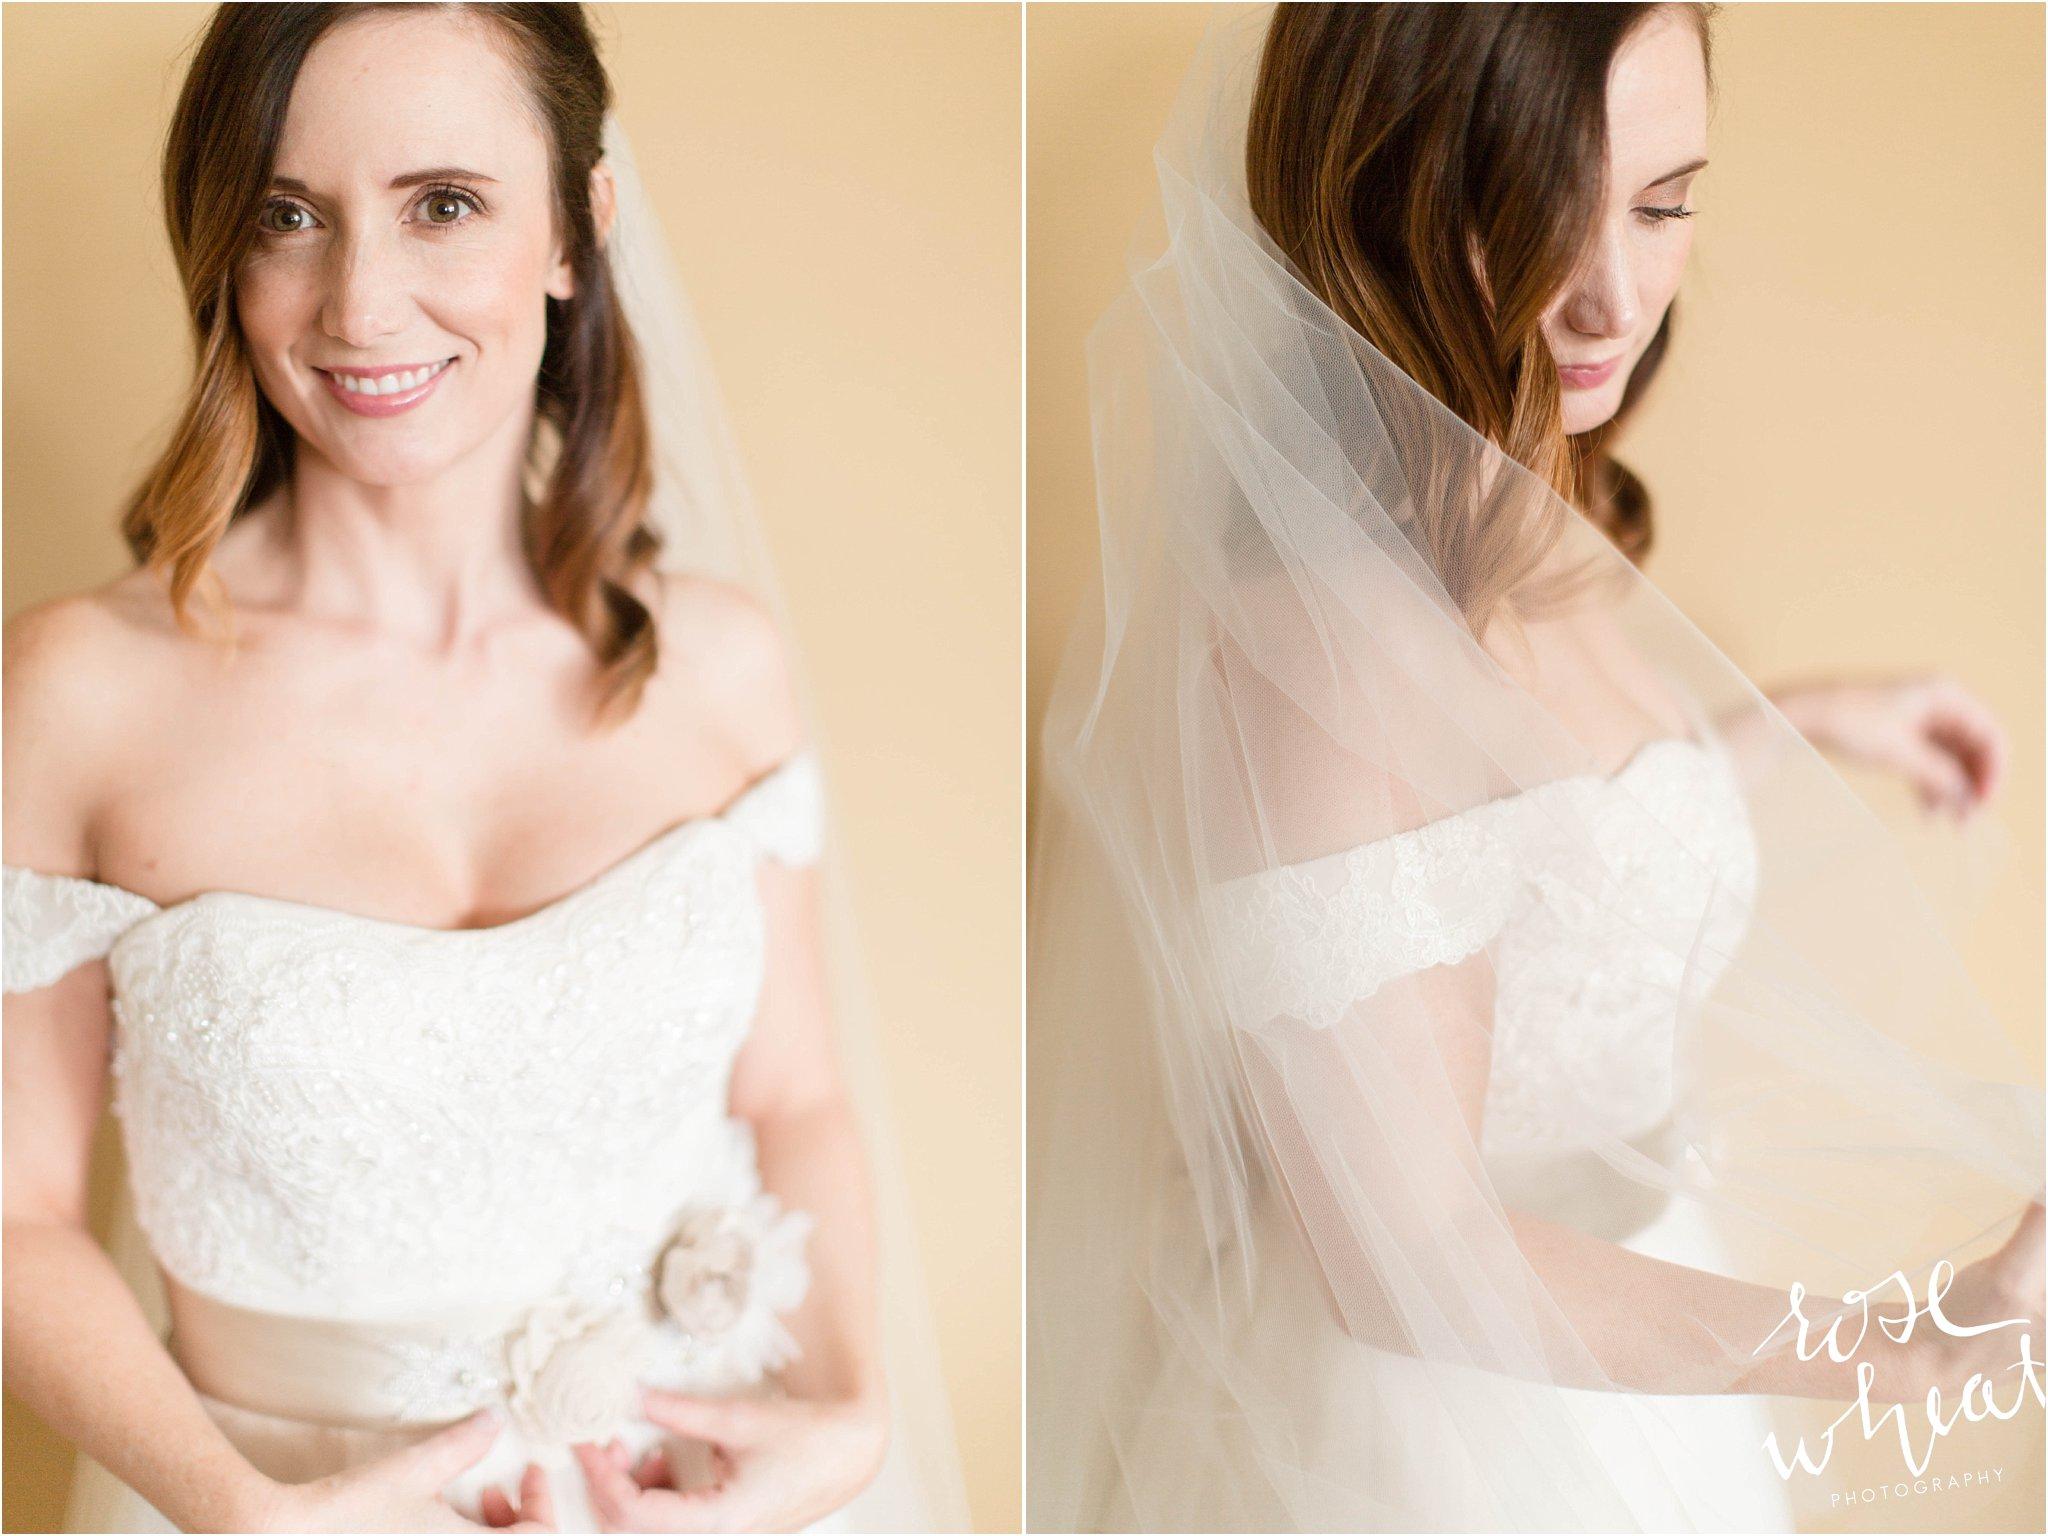 light airy bridal photos indoors.JPG